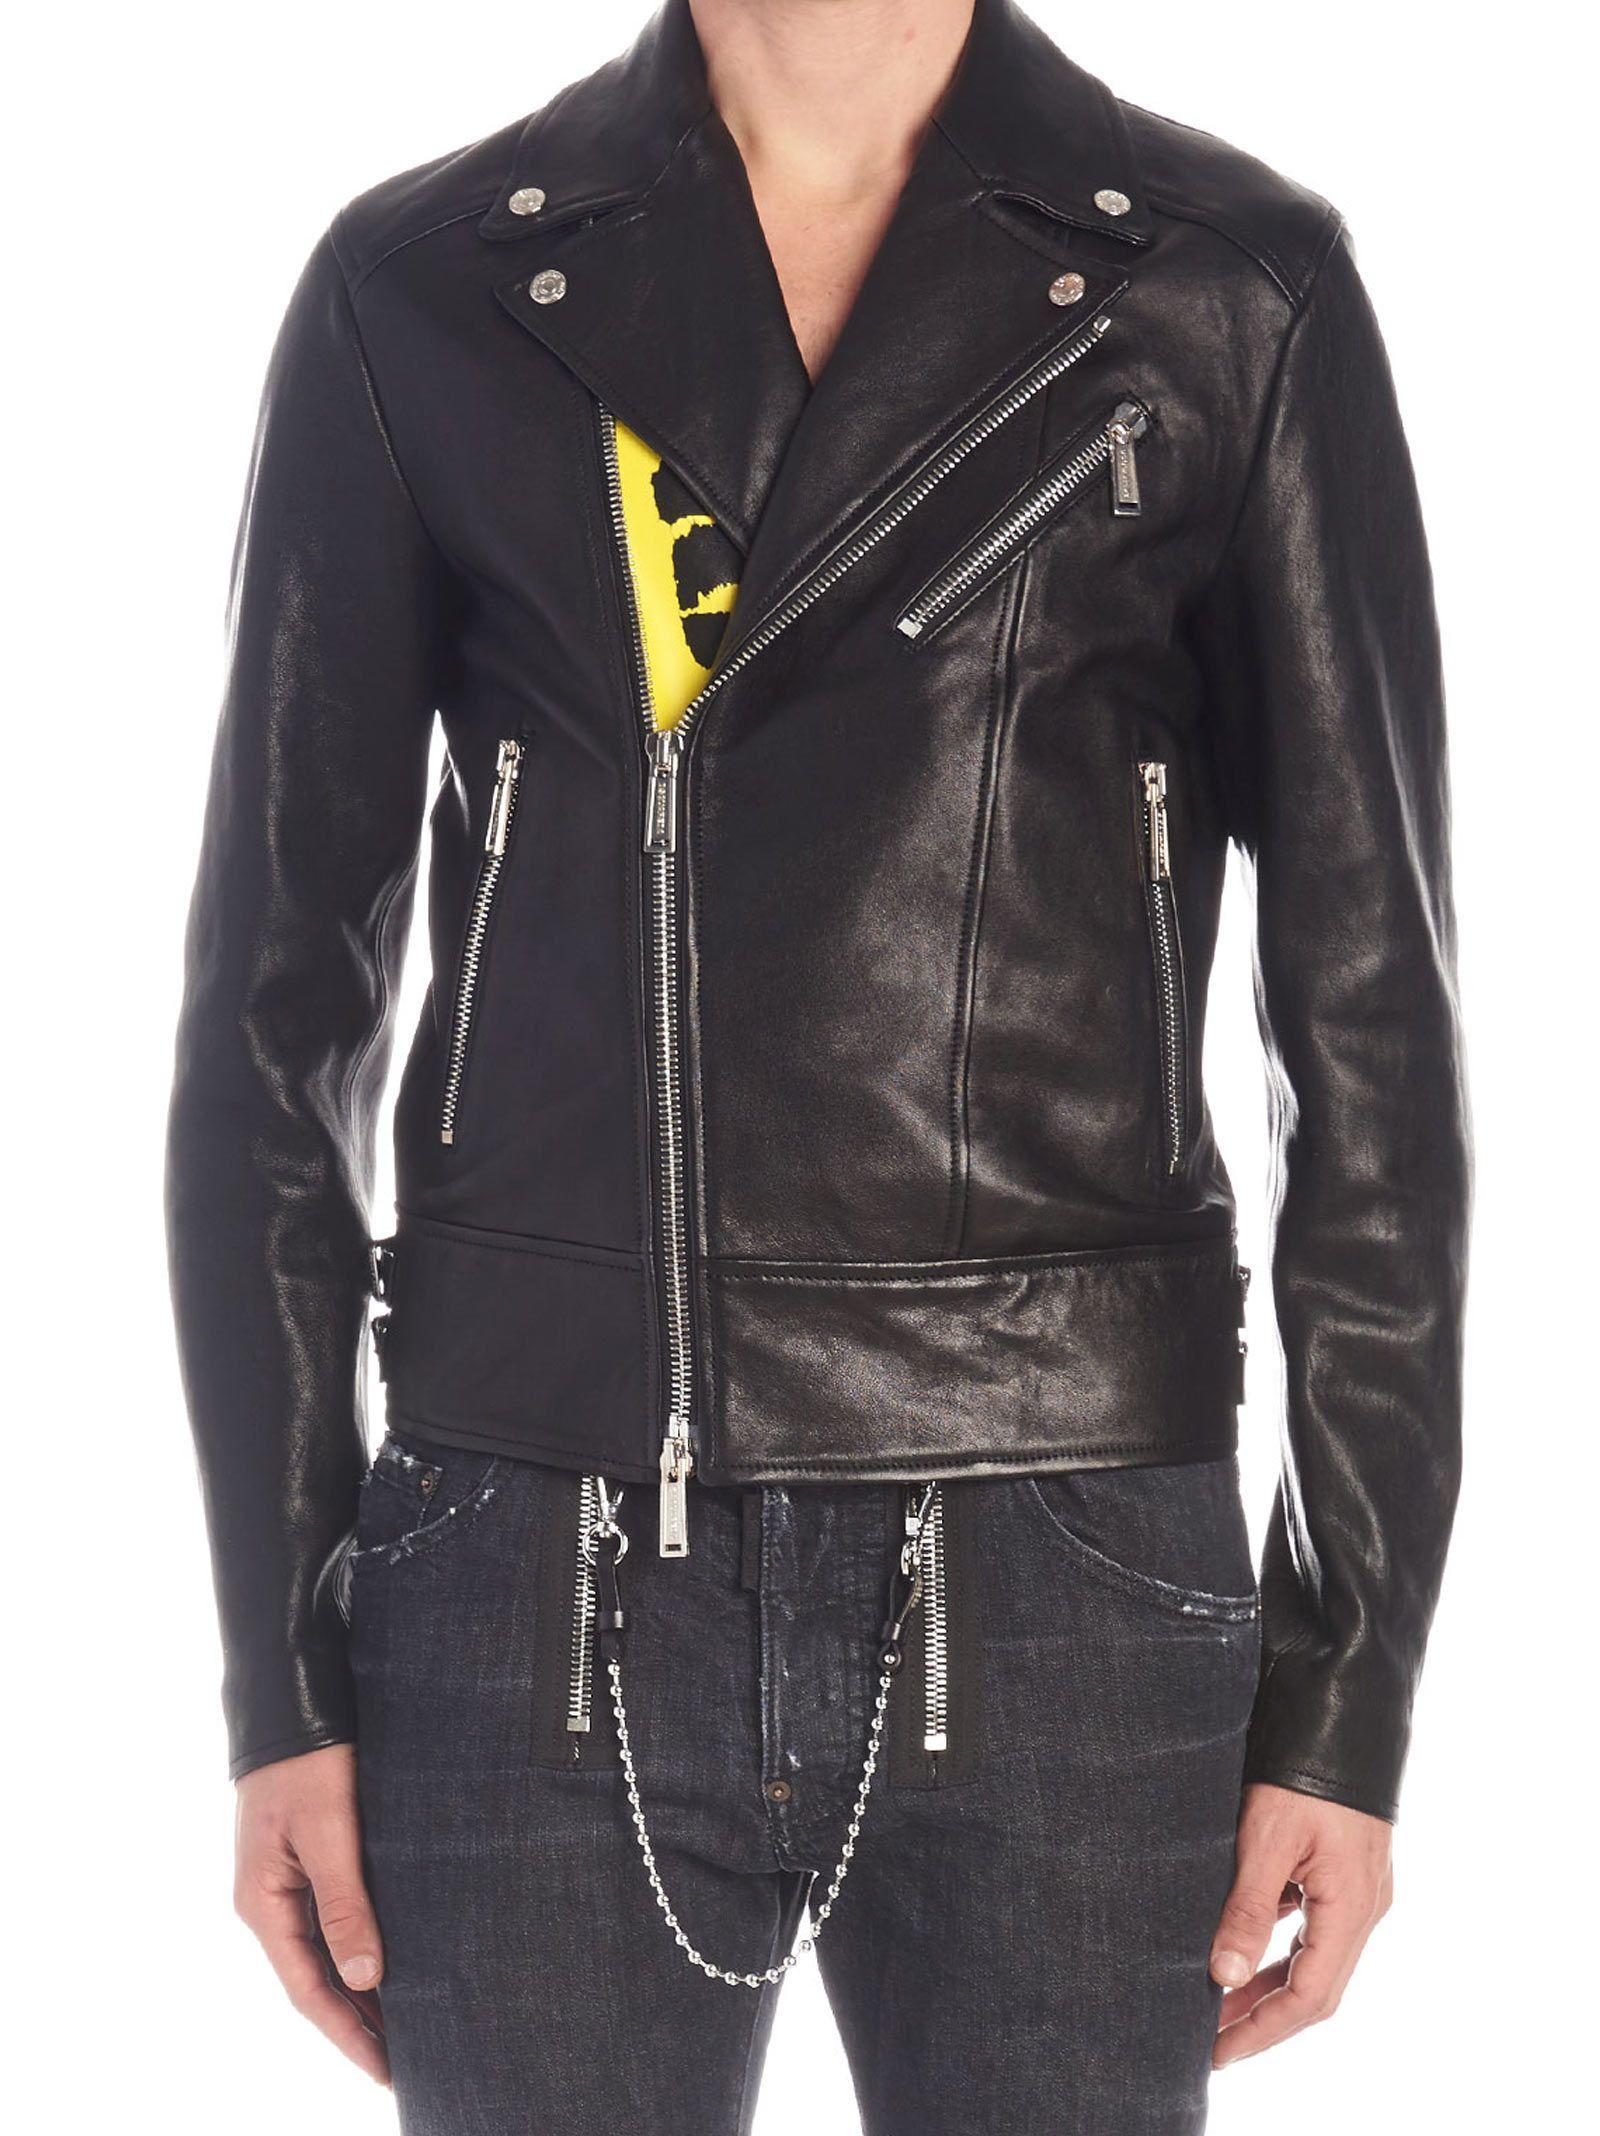 Dsquared2 Jacket Dsquared2 Cloth Leather Jacket Jackets Mens Luxury Fashion [ 2136 x 1600 Pixel ]